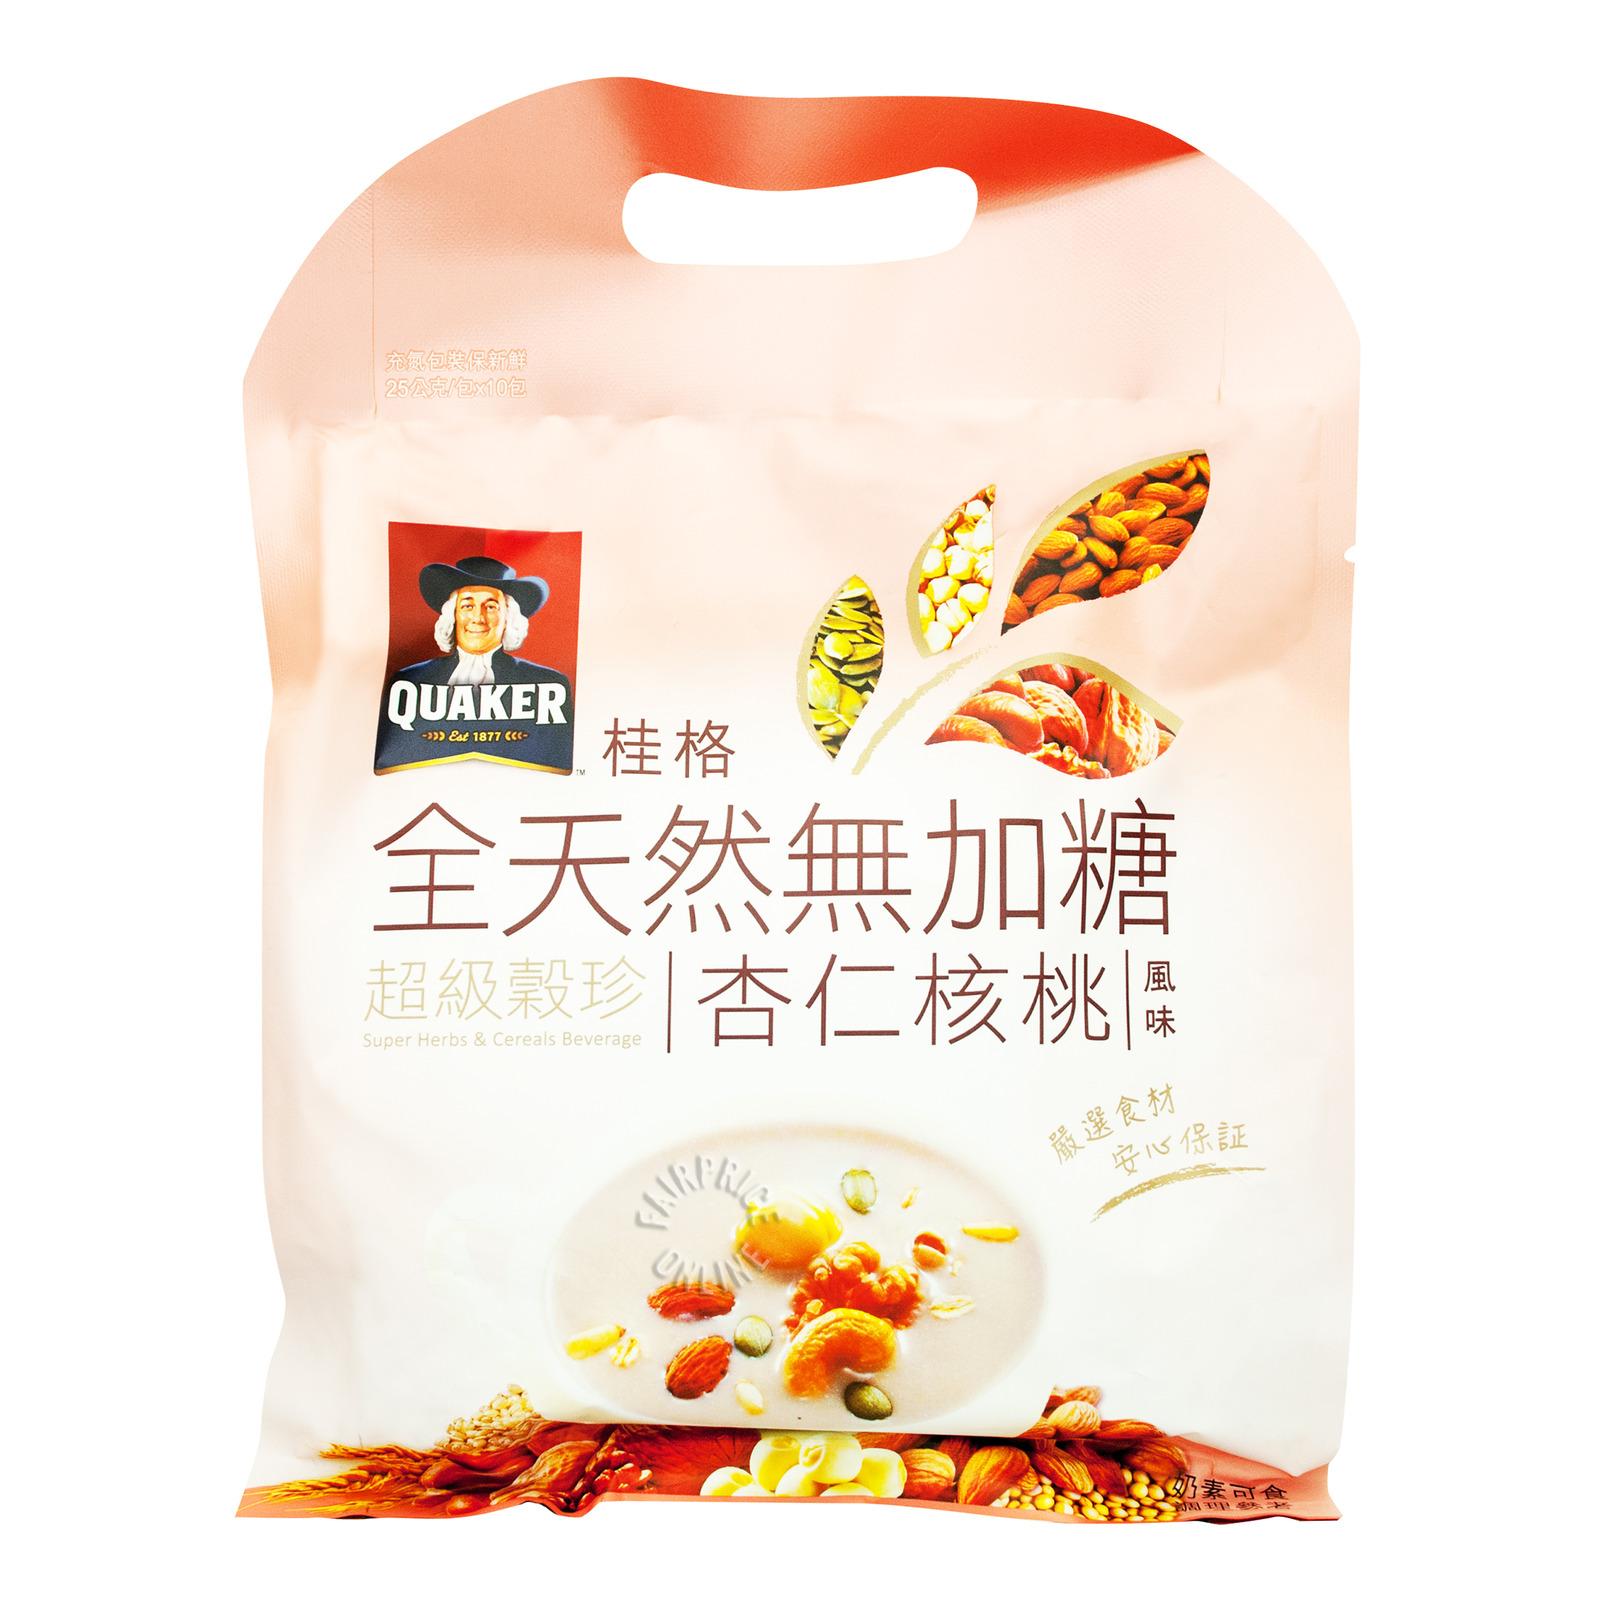 Quaker Super Herbs & Cereals Beverage - Almond